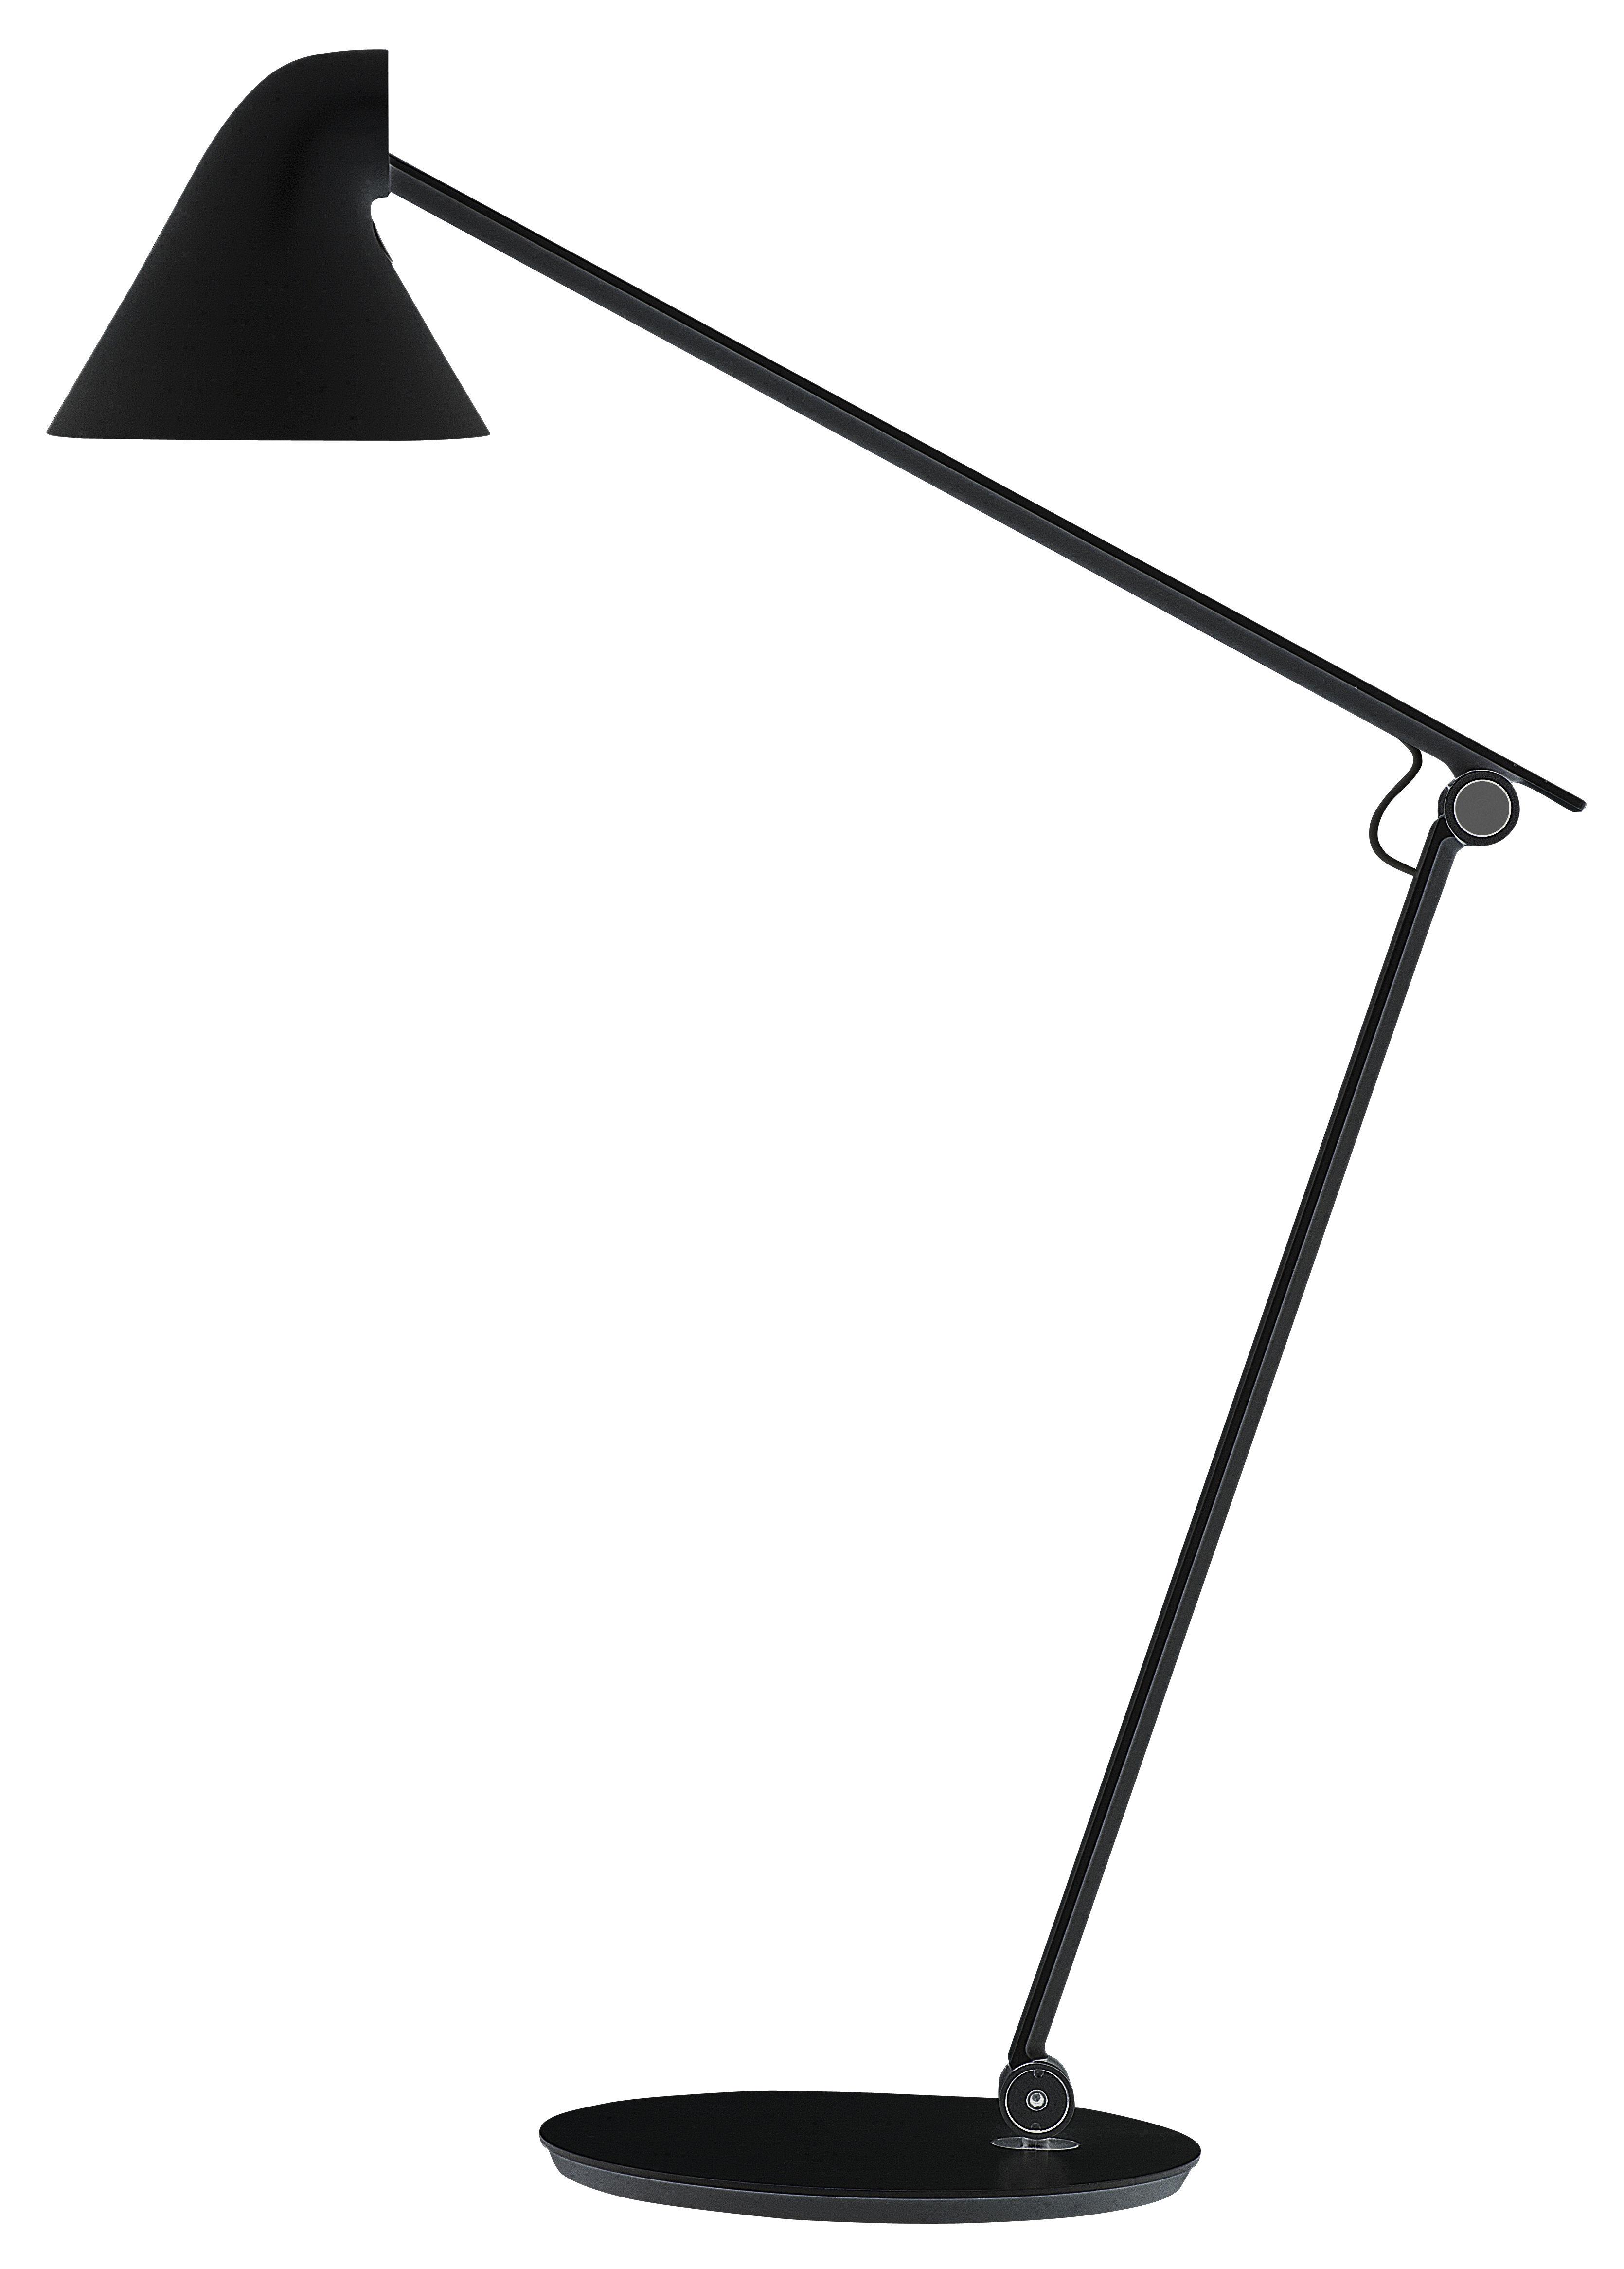 Lighting - Table Lamps - NJP Table lamp - LED by Louis Poulsen - Black - Very warm light 2700K - Aluminium, Steel